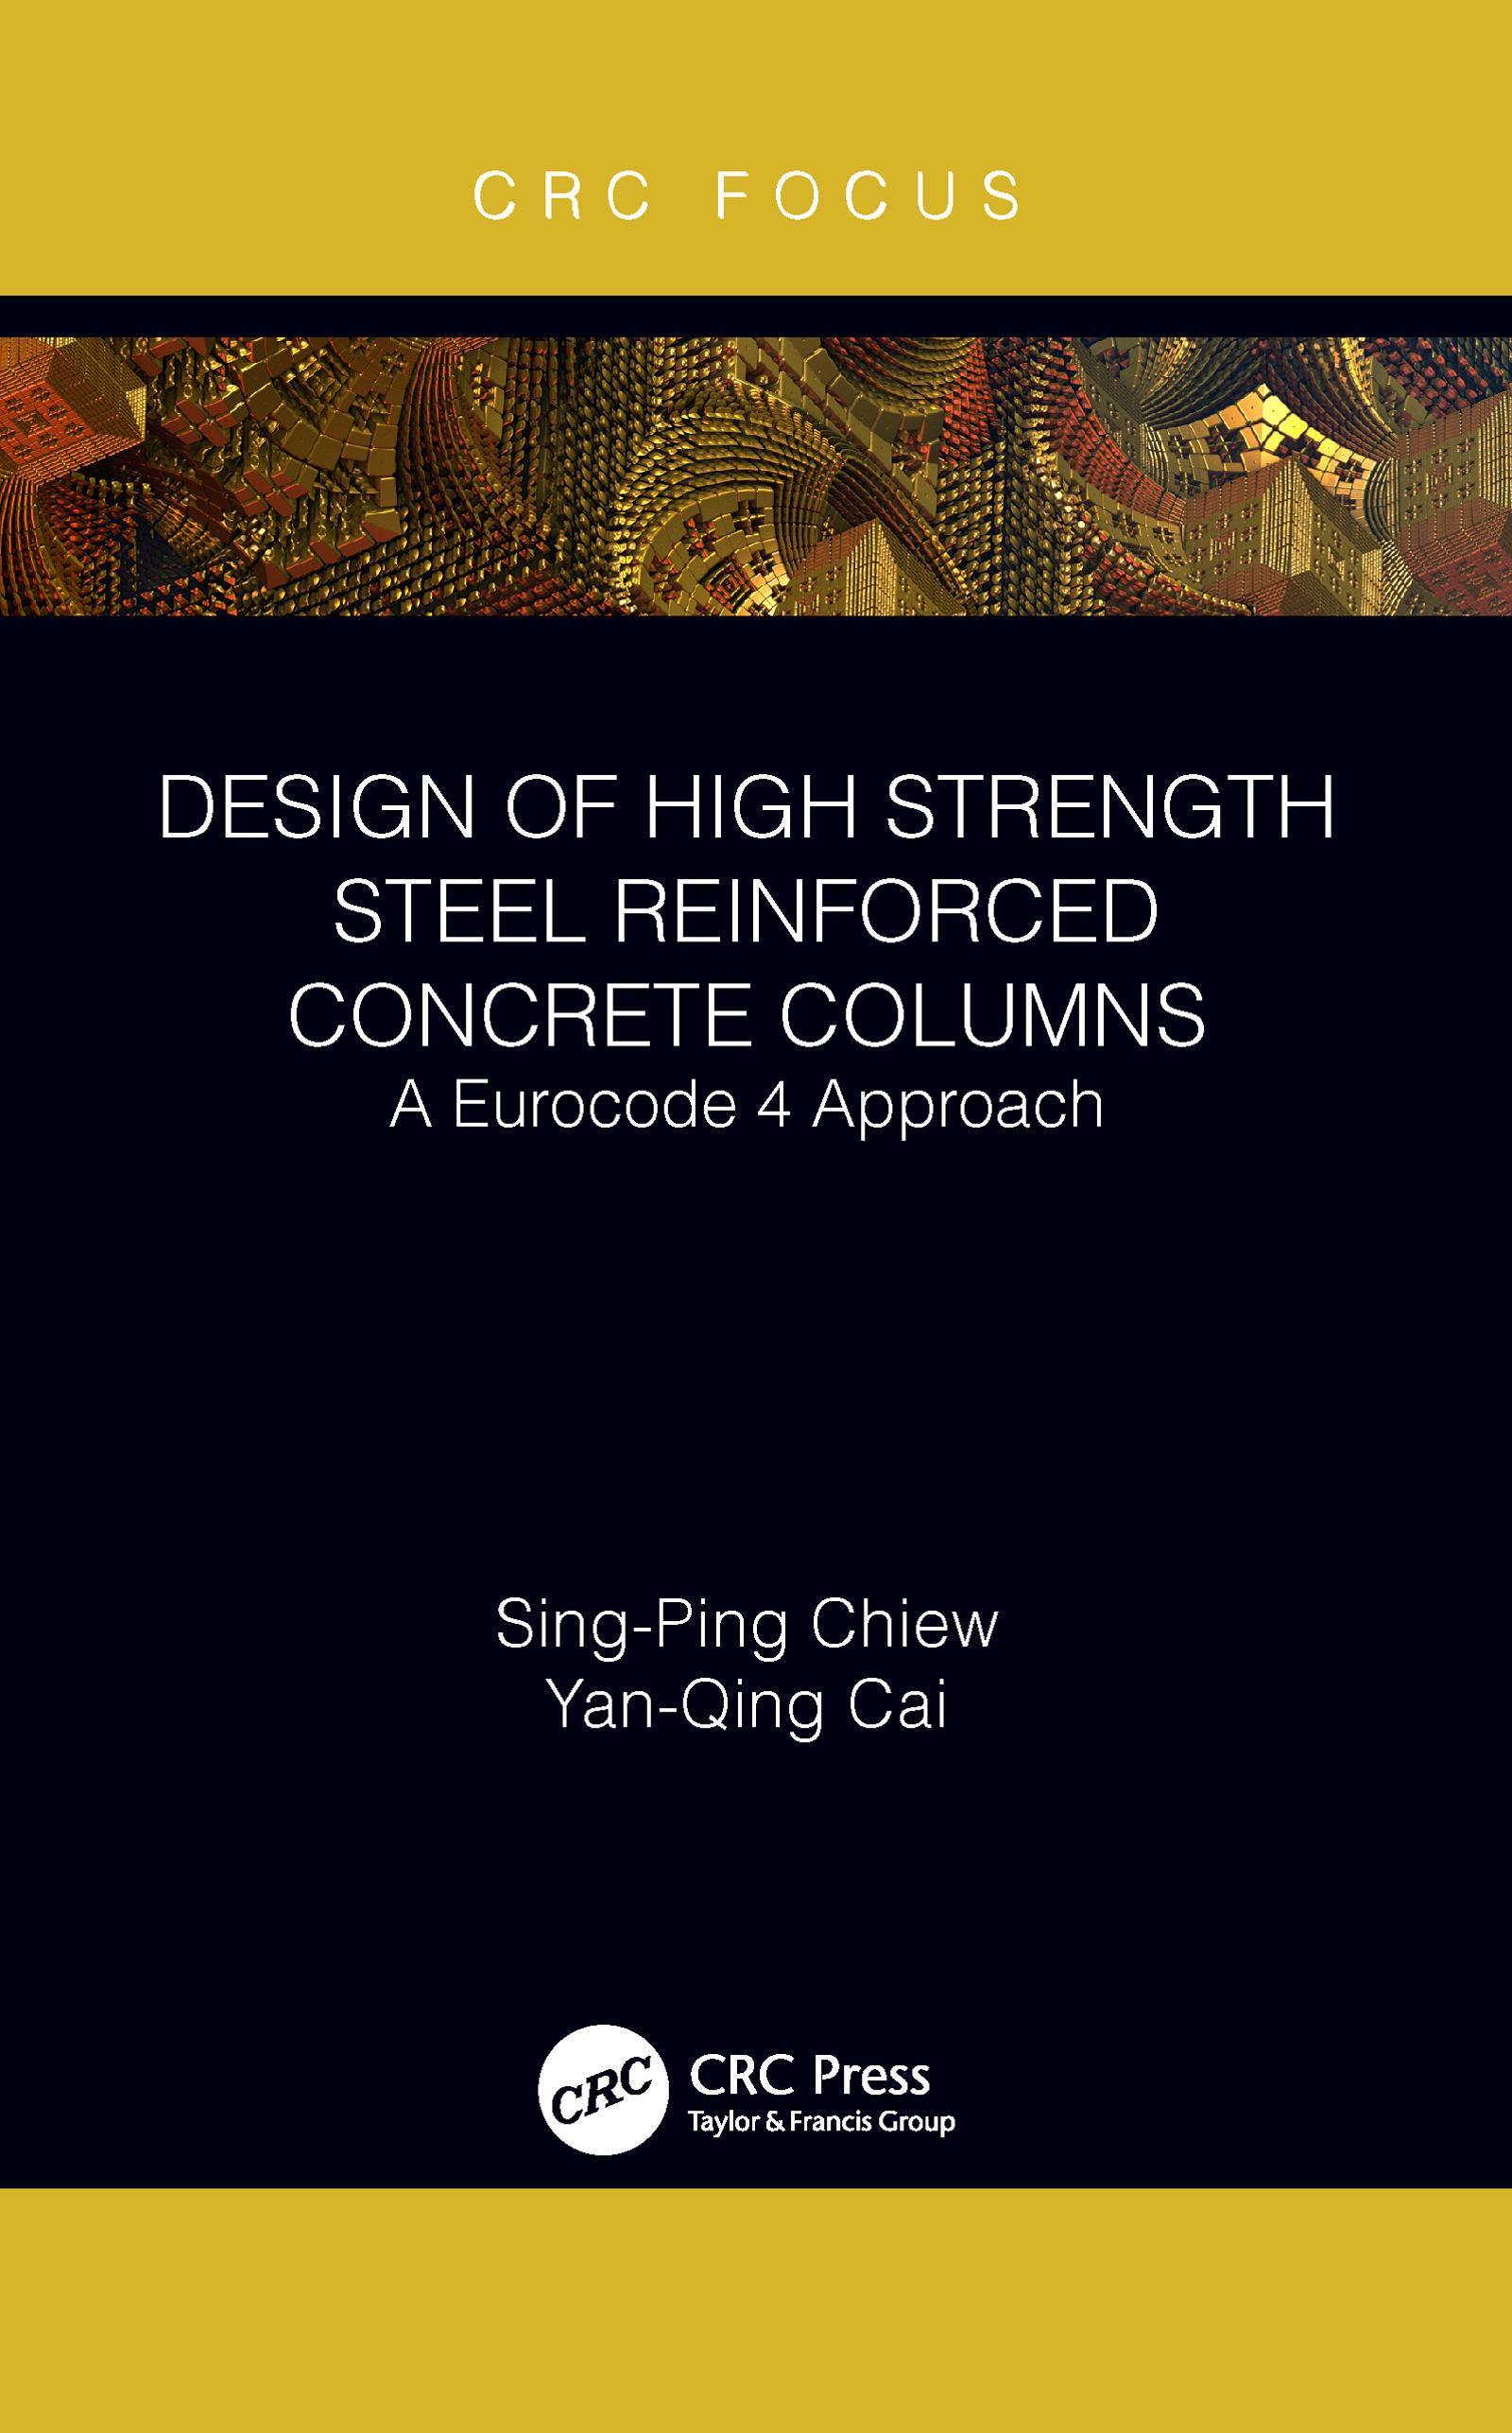 Design of High Strength Steel Reinforced Concrete Columns